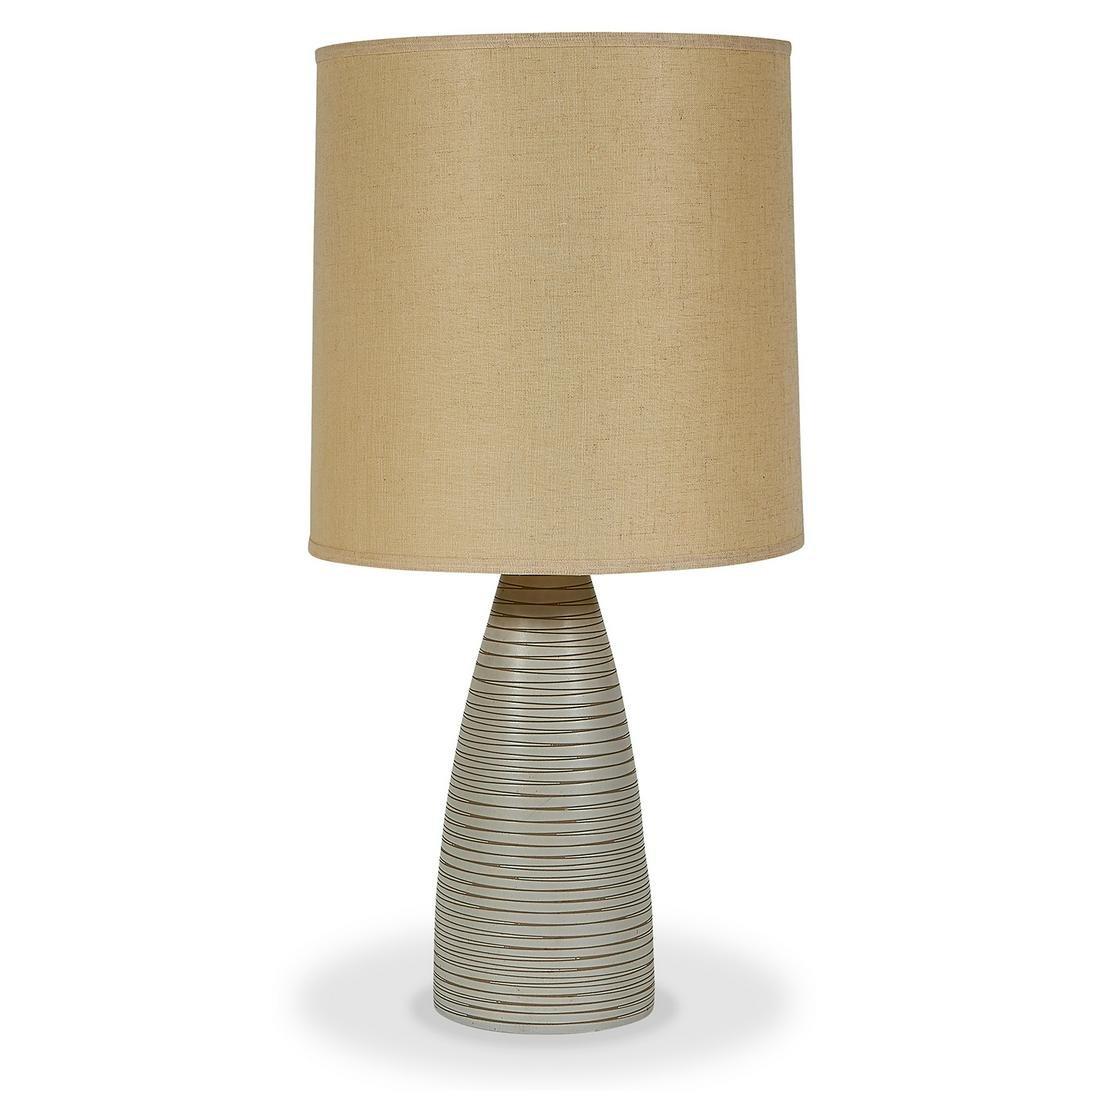 Gordon Martz & Jane Marshall Martz table lamp